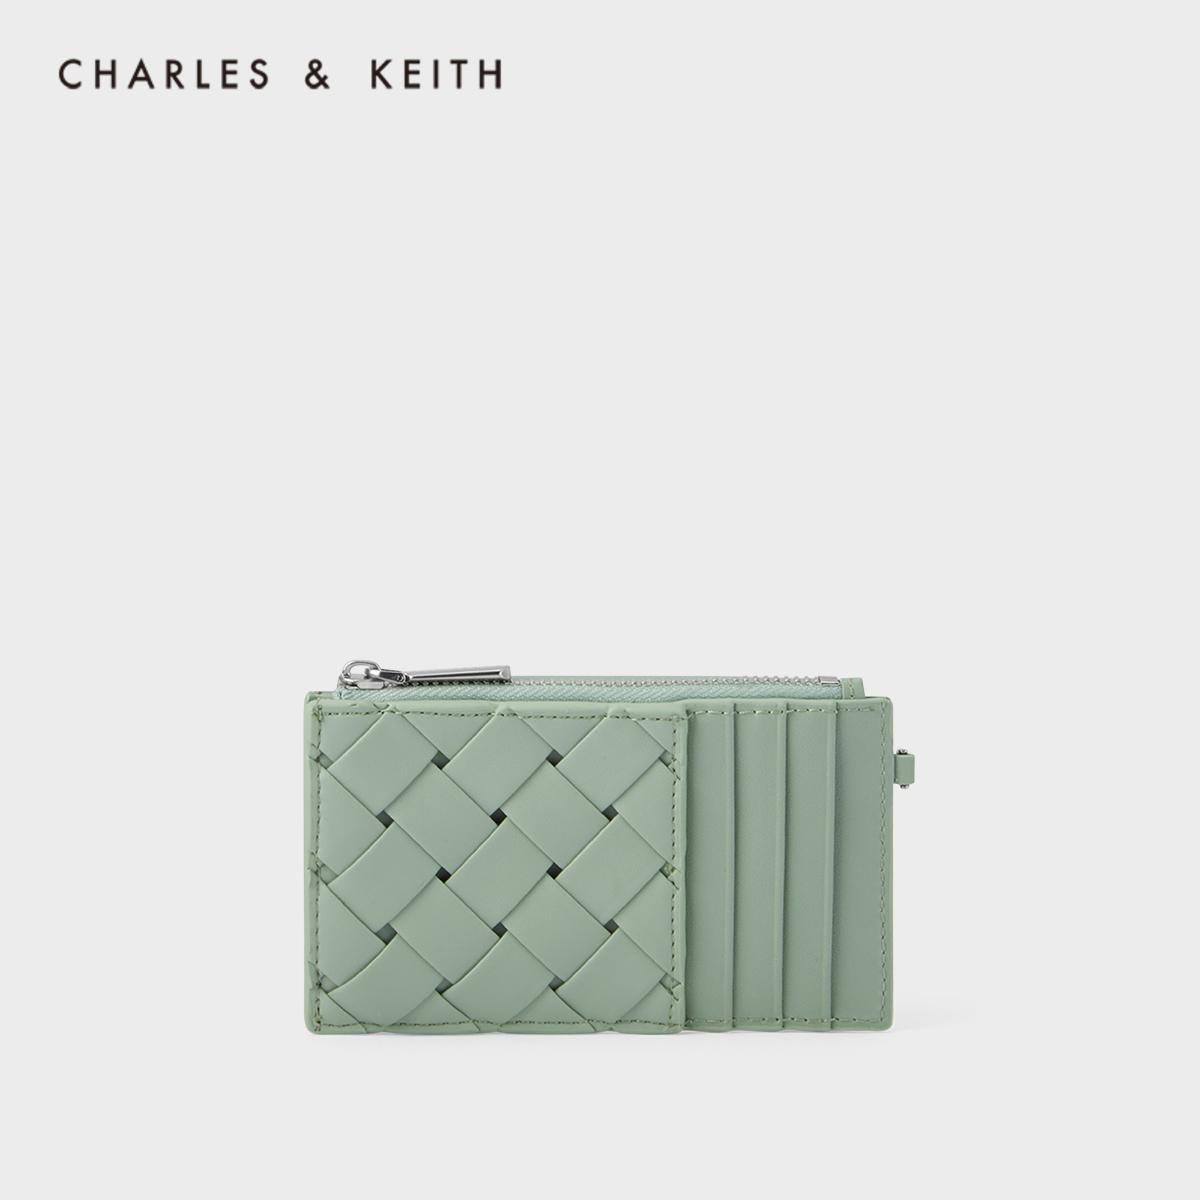 CHARLES&KEITH新品CK6-50840229女士编织设计零钱包卡包